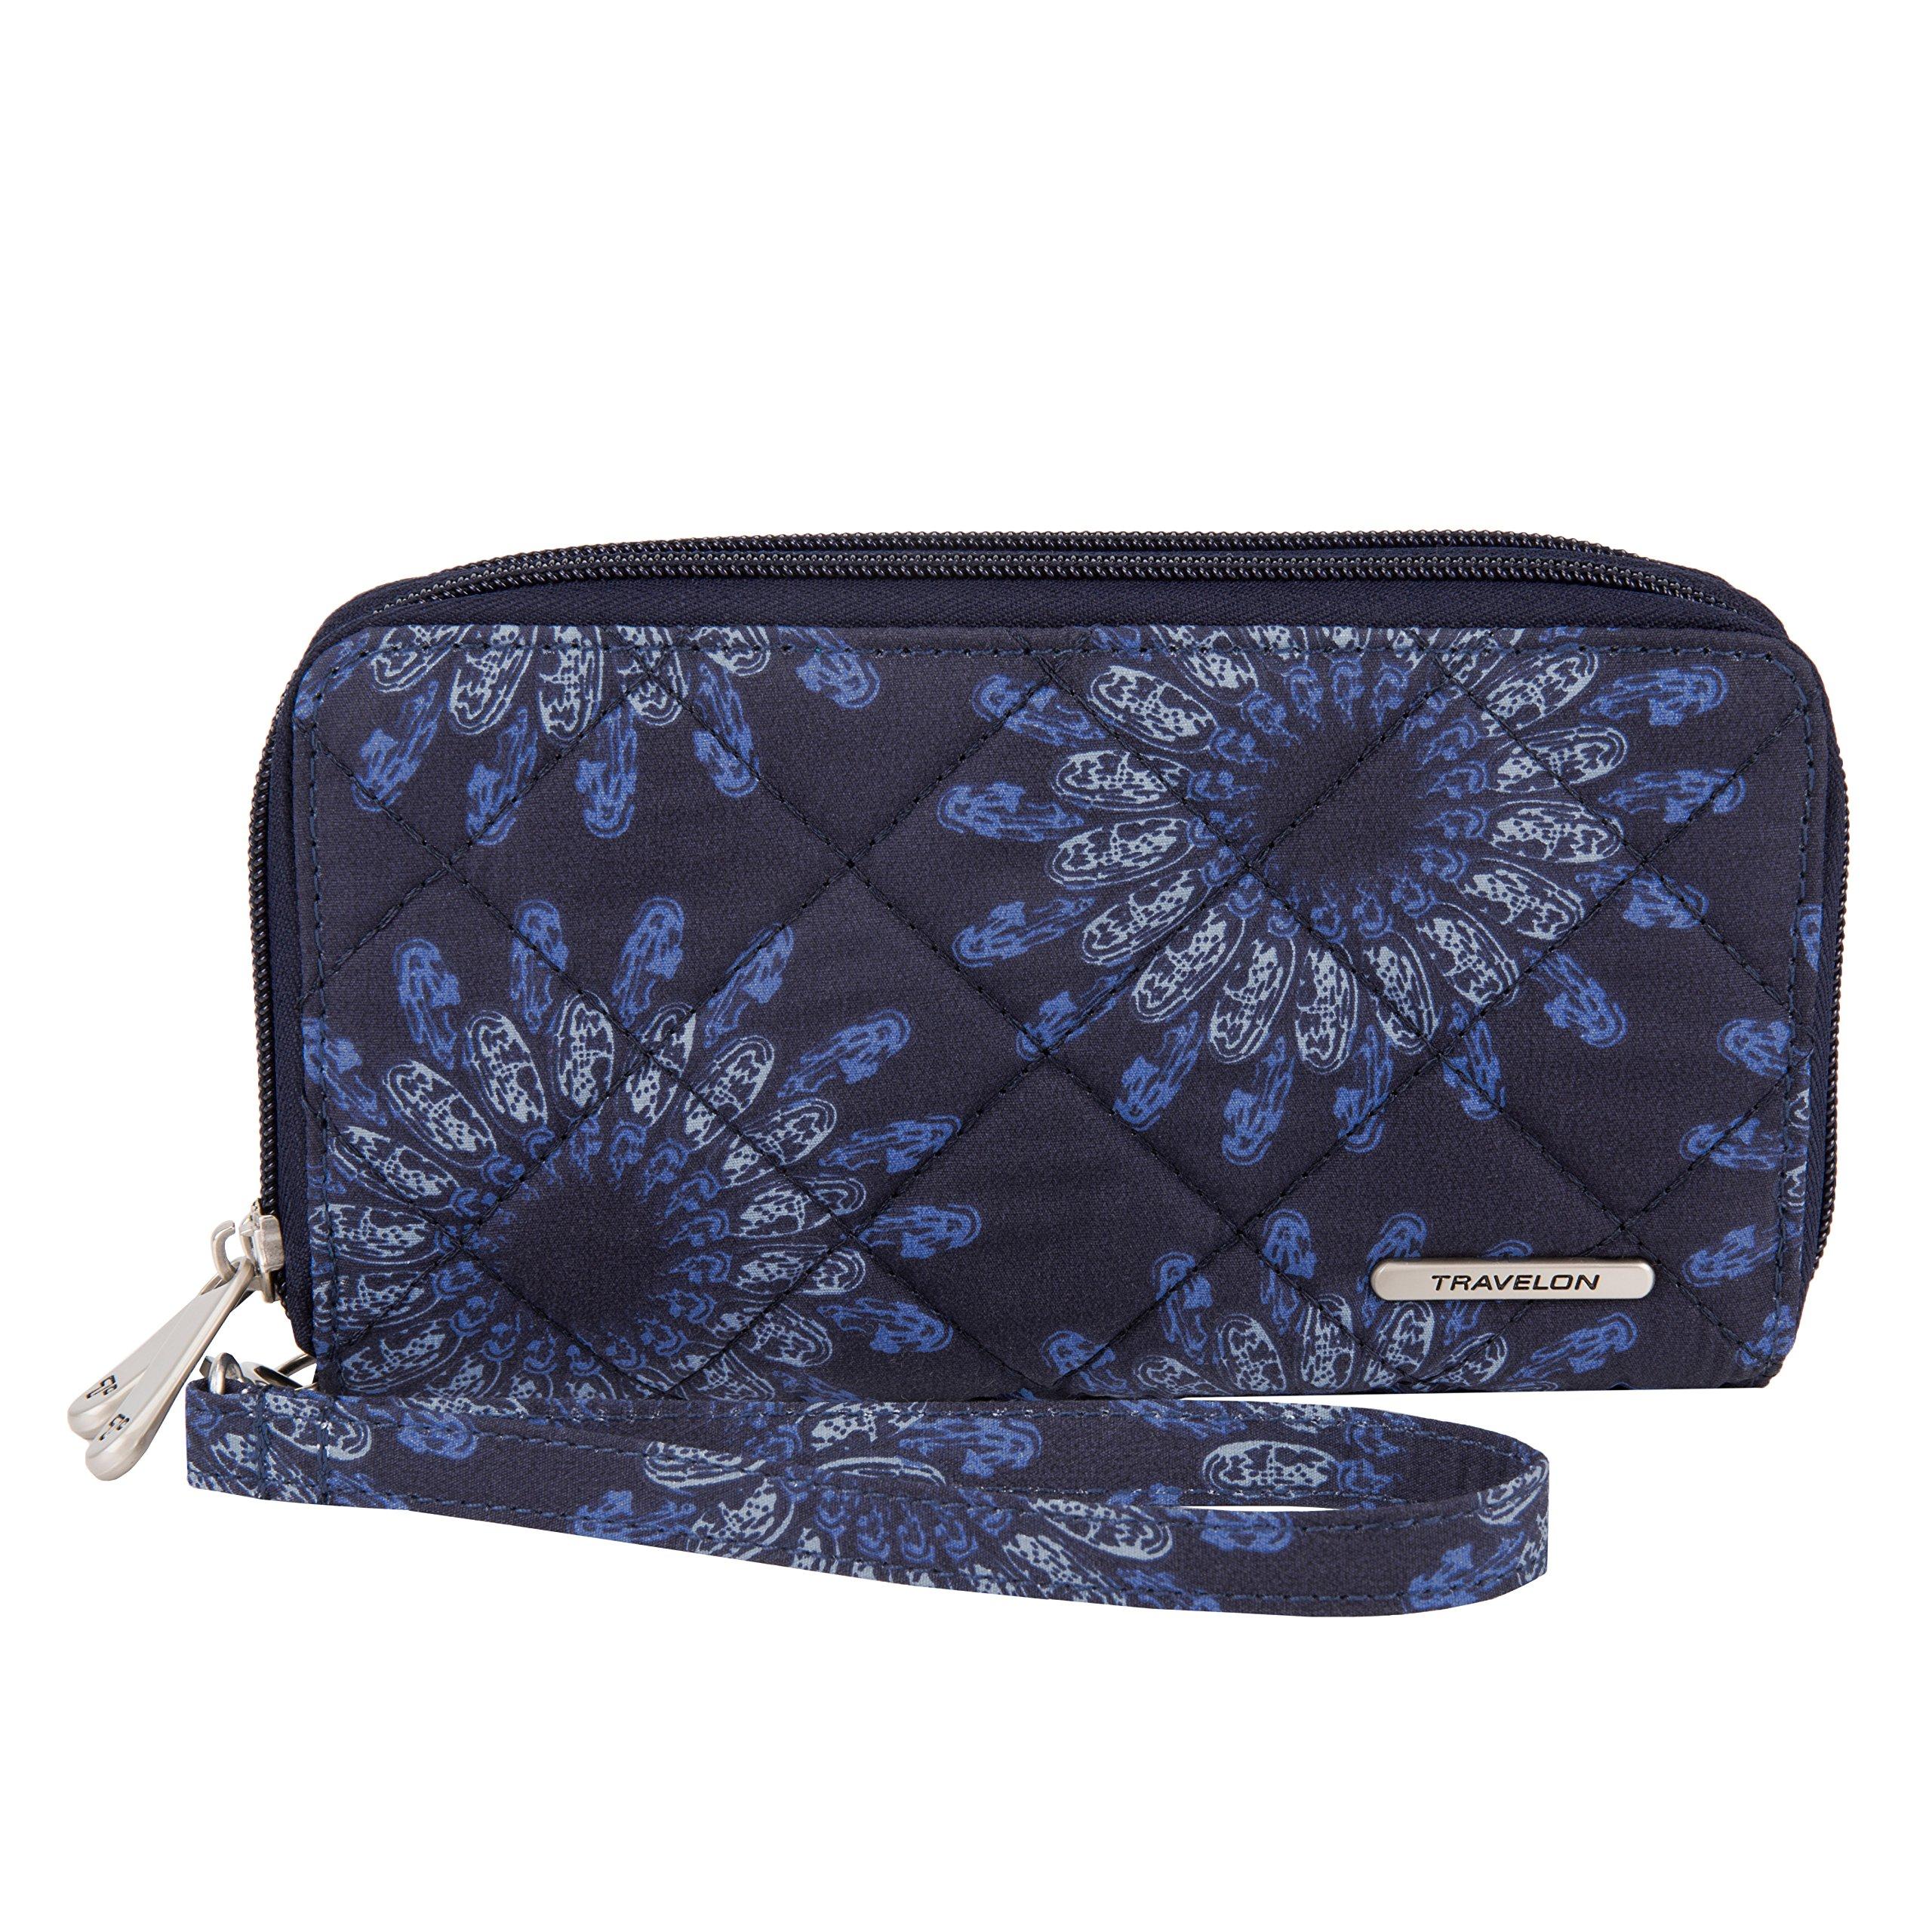 Travelon Women's Boho Ladies Wallet, Geo Sunflower by Travelon (Image #1)